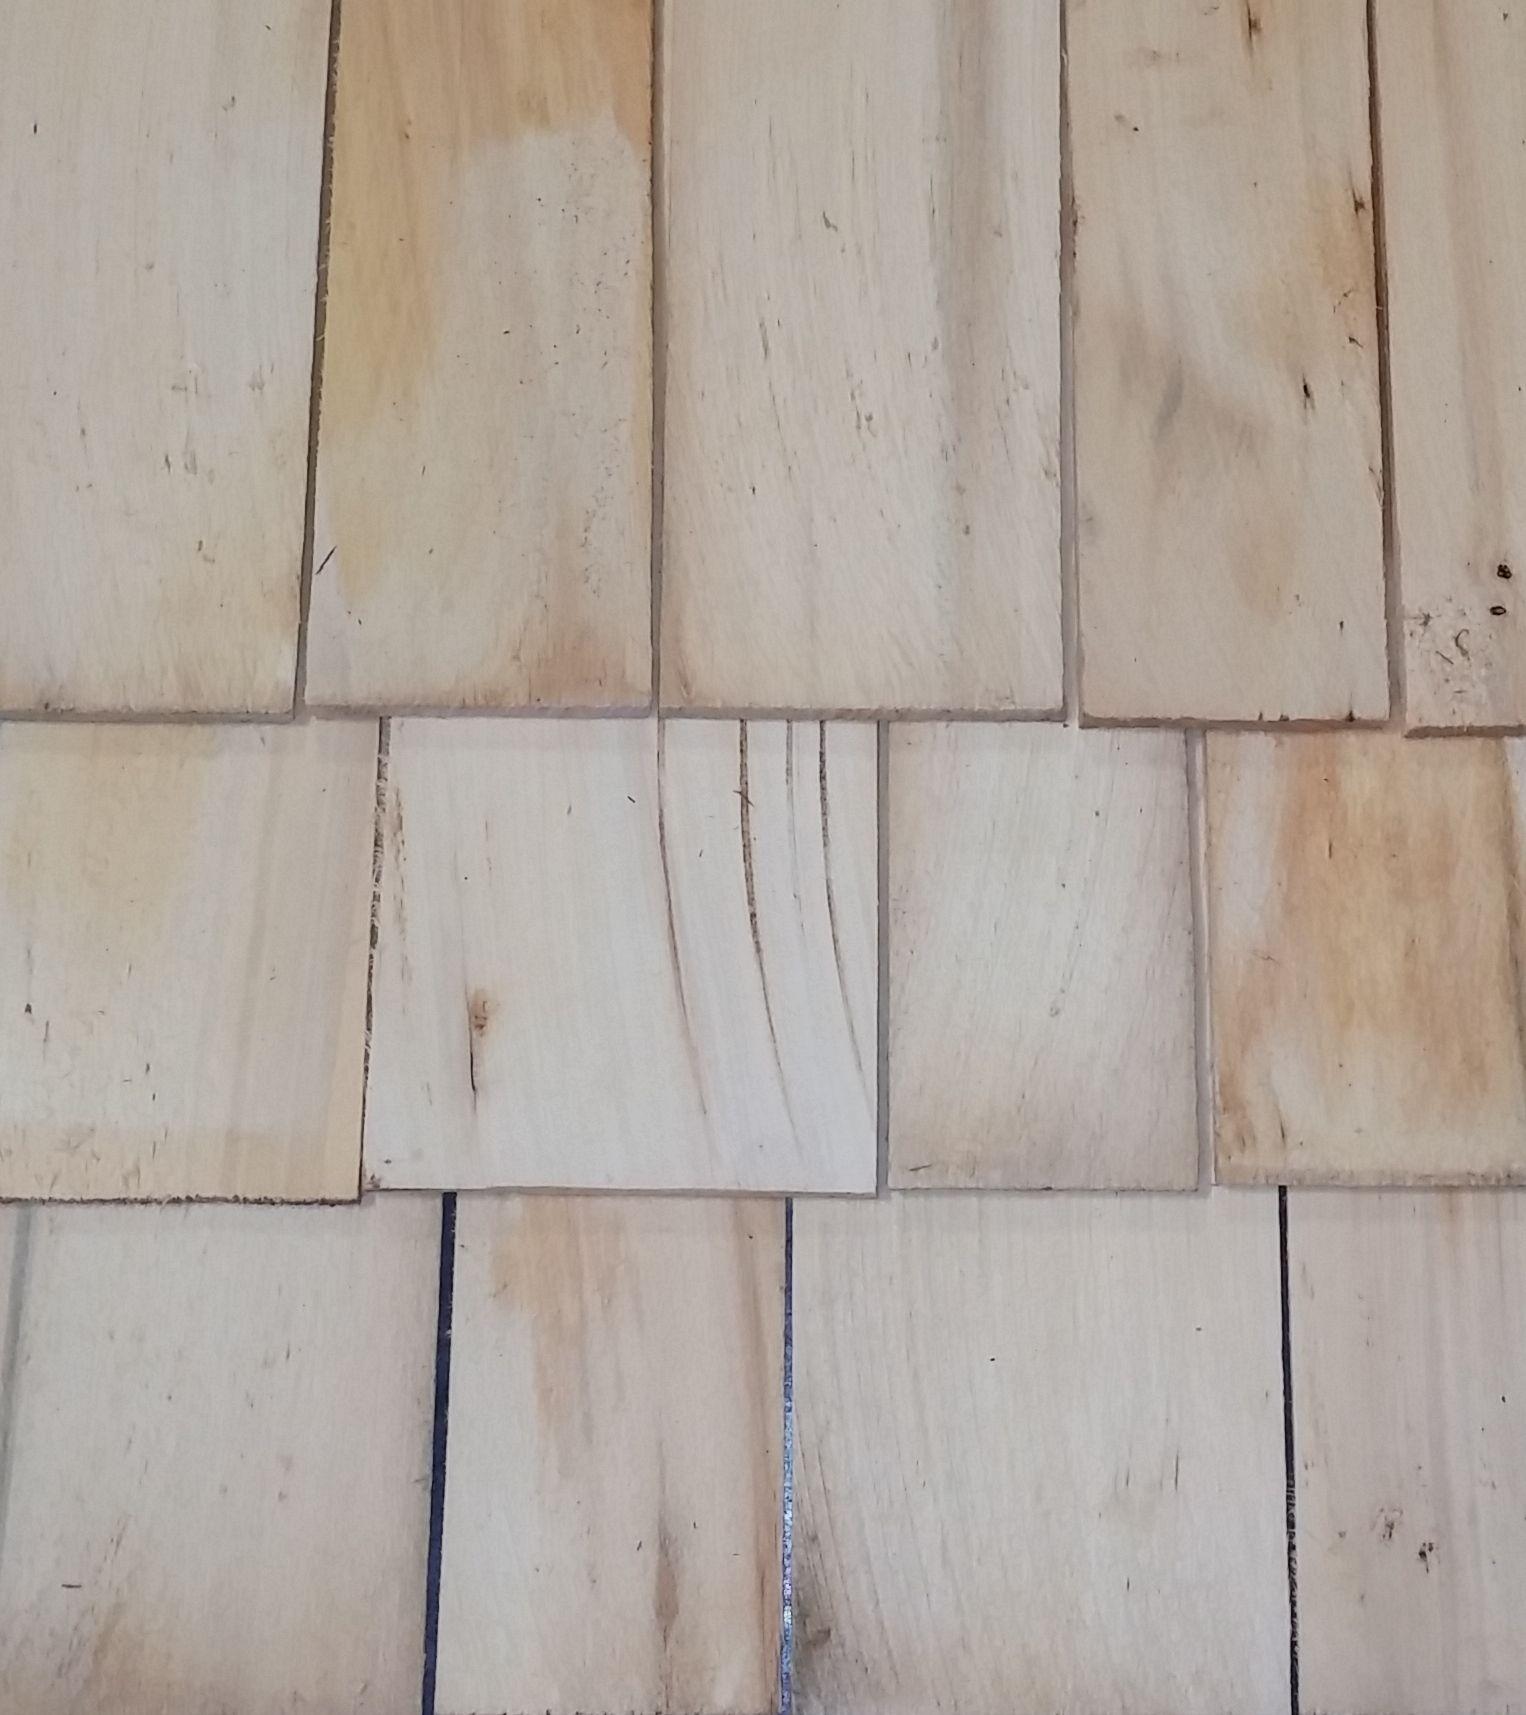 Best Alaskan Yellow Cedar Shingles And Shakes Shipley Lumber Google Search Exterior Pinterest 400 x 300